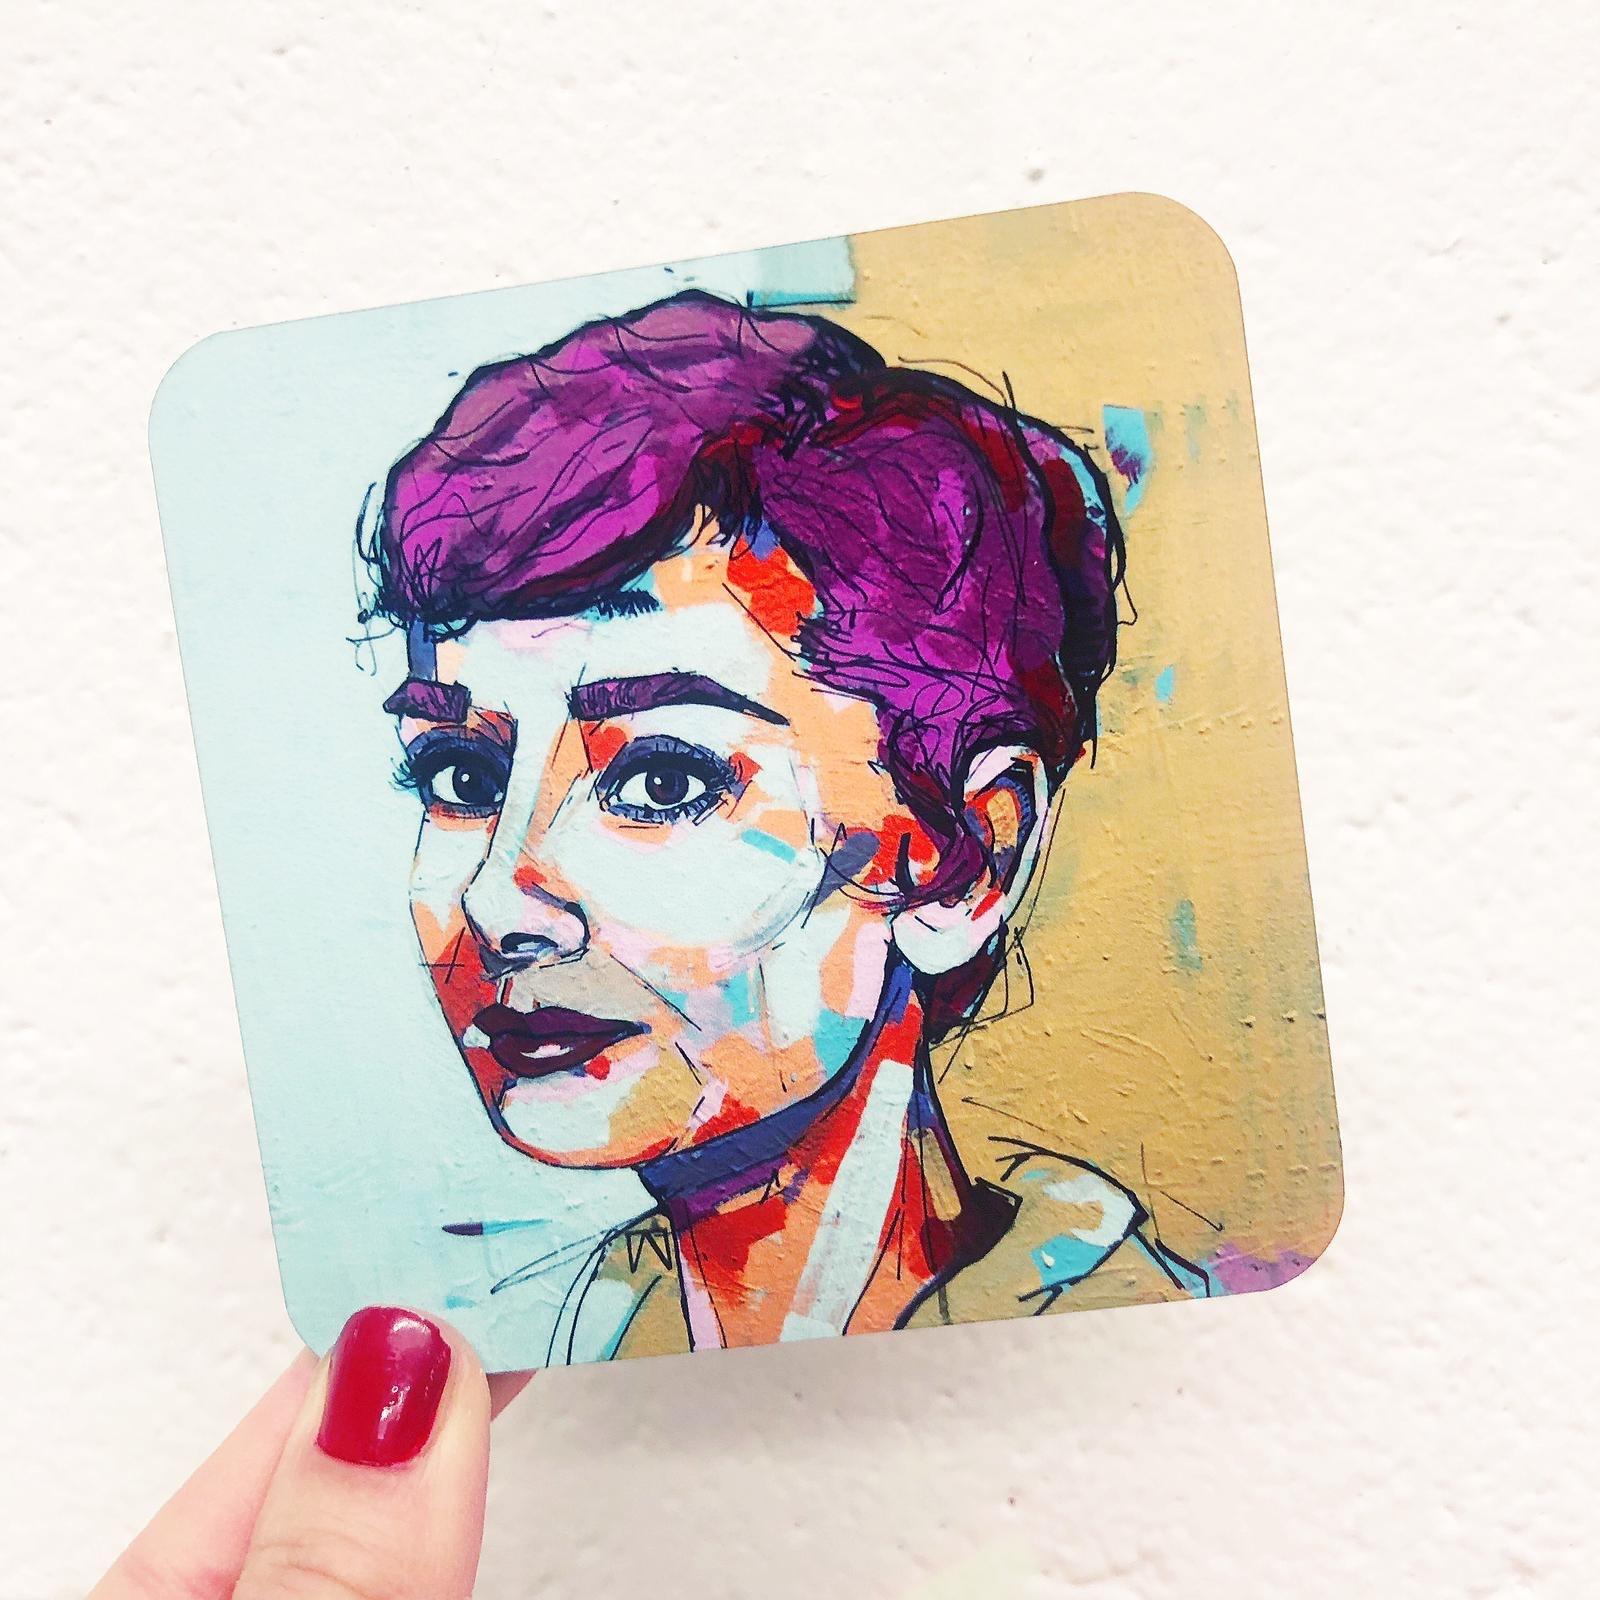 Personalised photo coasters: 'Punk Audrey' Audrey Hepburn by designer Laura Selevos